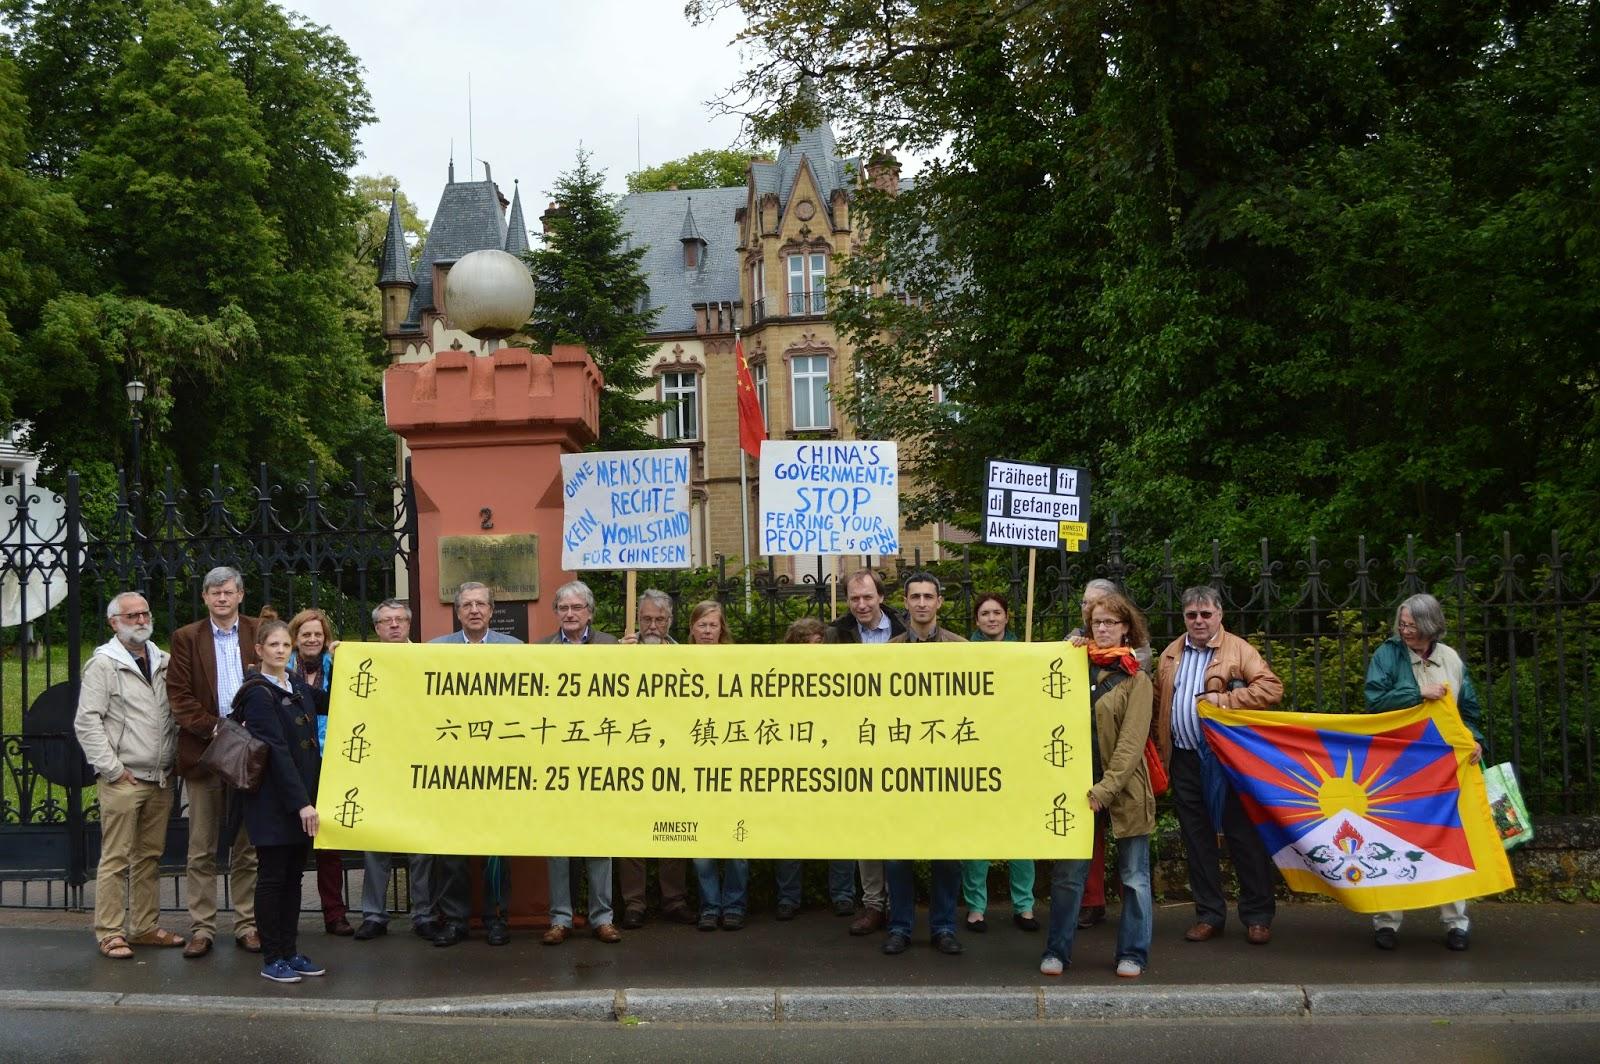 http://amnesty-luxembourg-photos.blogspot.com/2014/06/25eme-anniversaire-detiananmen.html